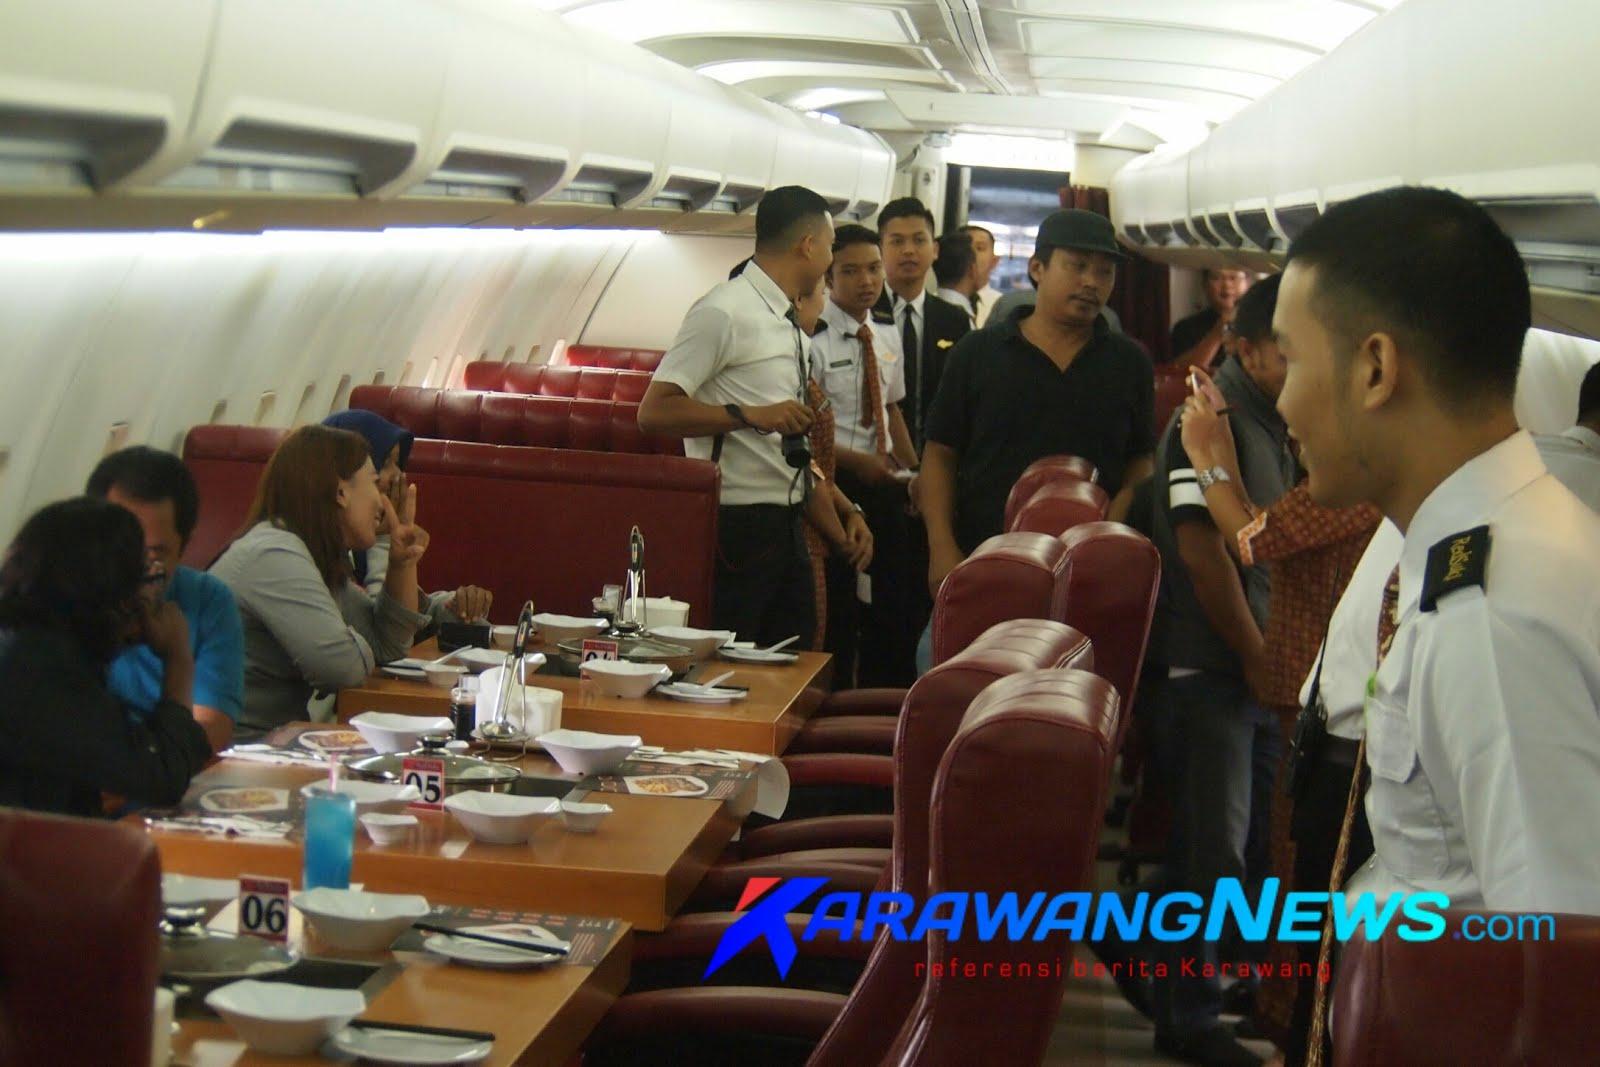 Sensasi Makan Steak Dan Suki Di Dalam Pesawat Karawangnews